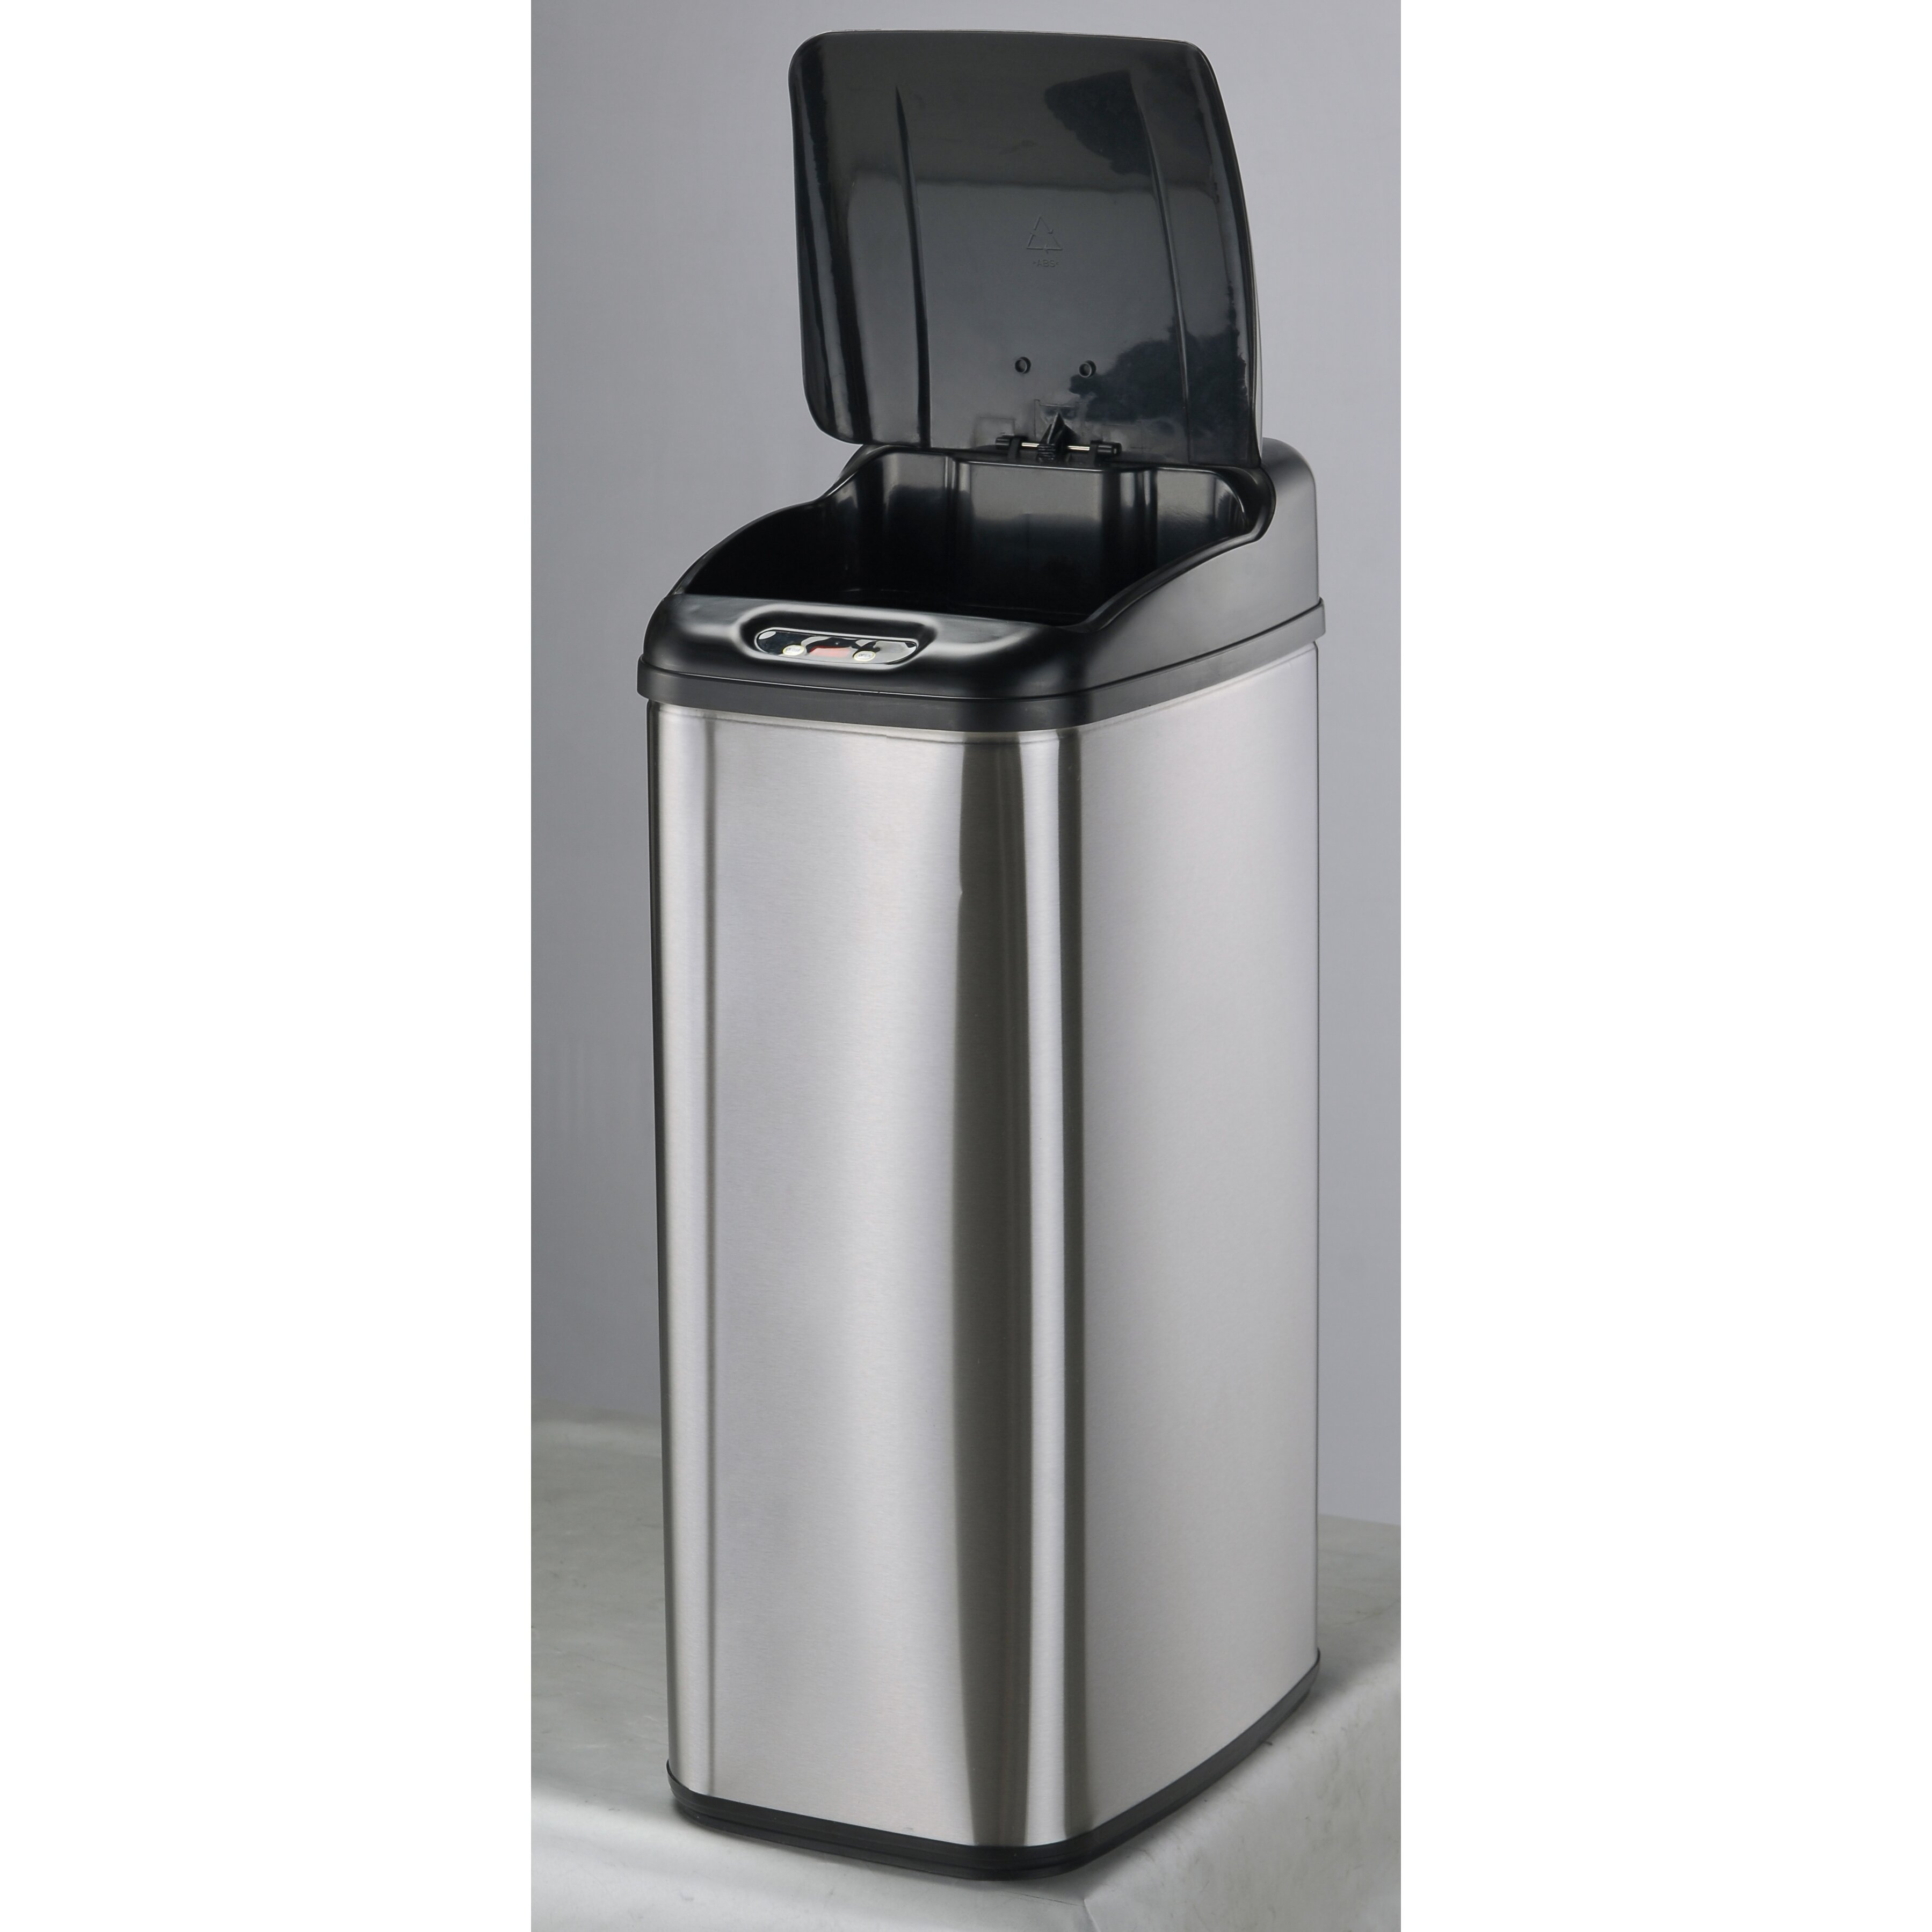 Black Kitchen Trash Cans Nine Stars Nine Stars 132 Gallon Motion Sensor Stainless Steel